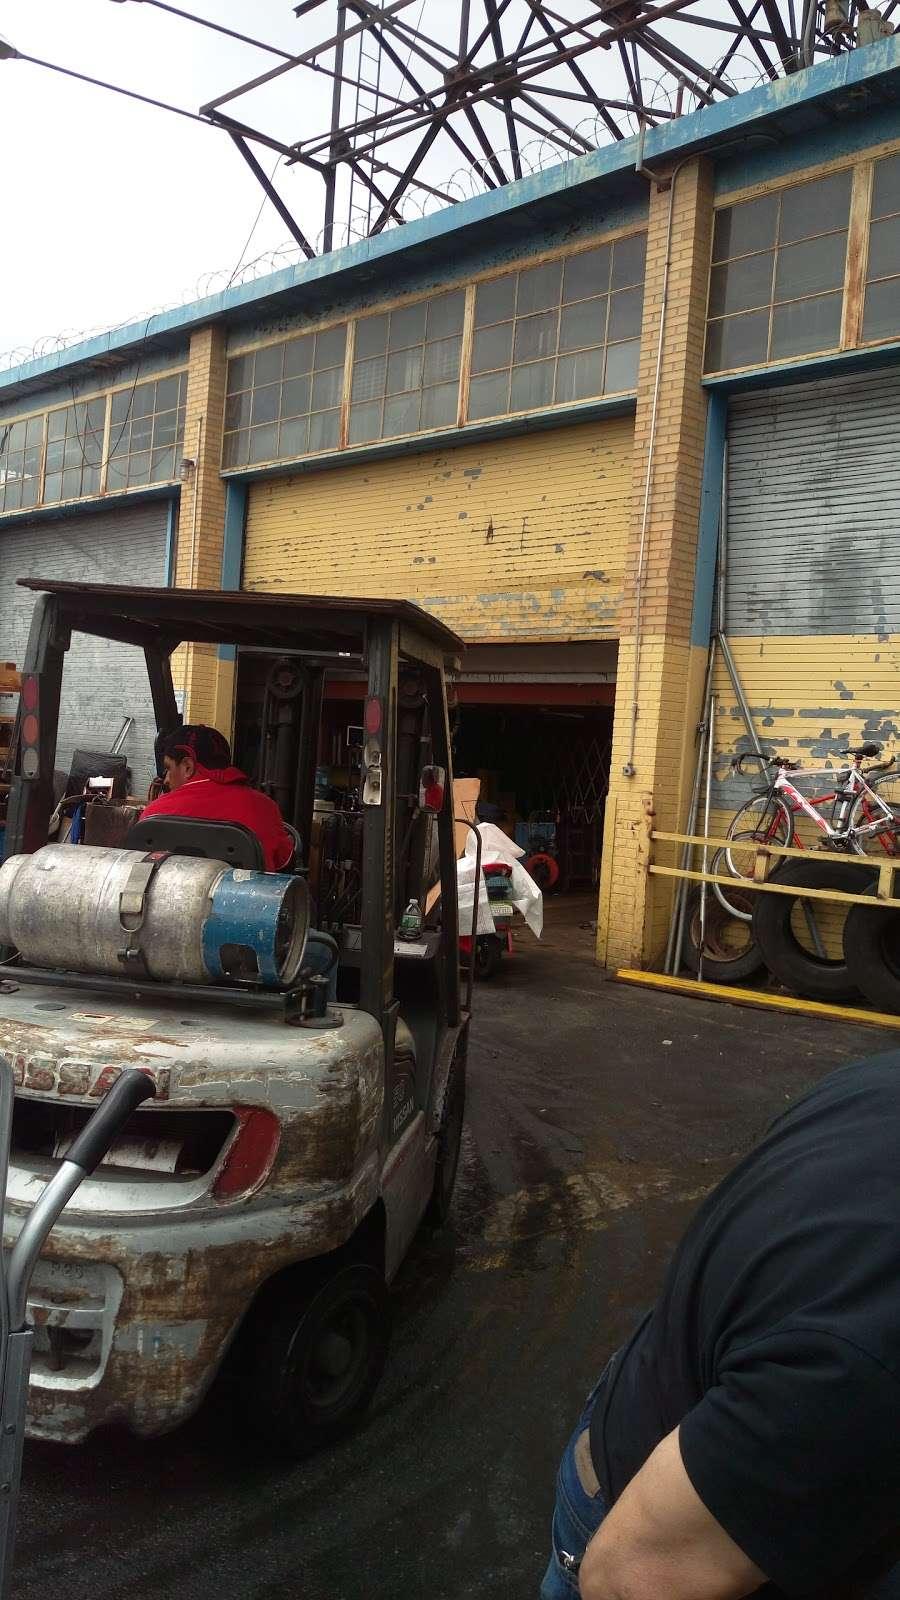 Wanrong Trading Truck Docks - storage  | Photo 4 of 10 | Address: 32-27-, 32-45 Hunters Point Ave, Long Island City, NY 11101, USA | Phone: (718) 361-8882